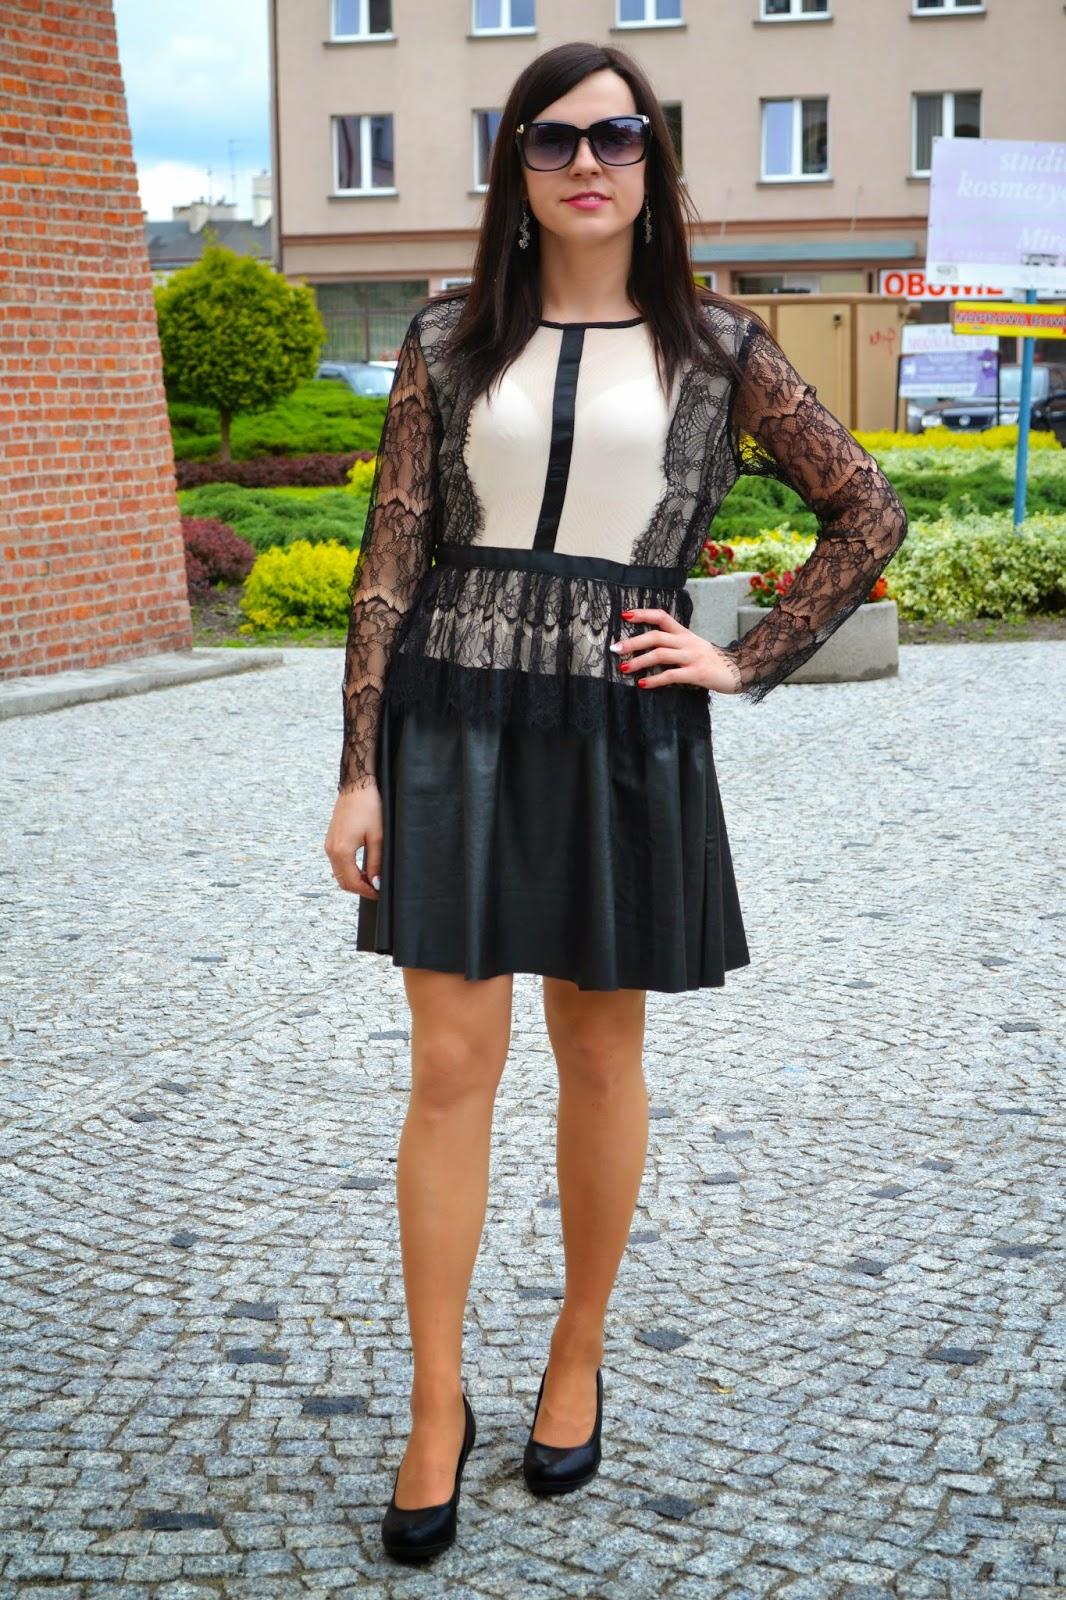 Vixen Fashion Blog O Modzie Urodzie Blog Lifestylowy Fashion Blog